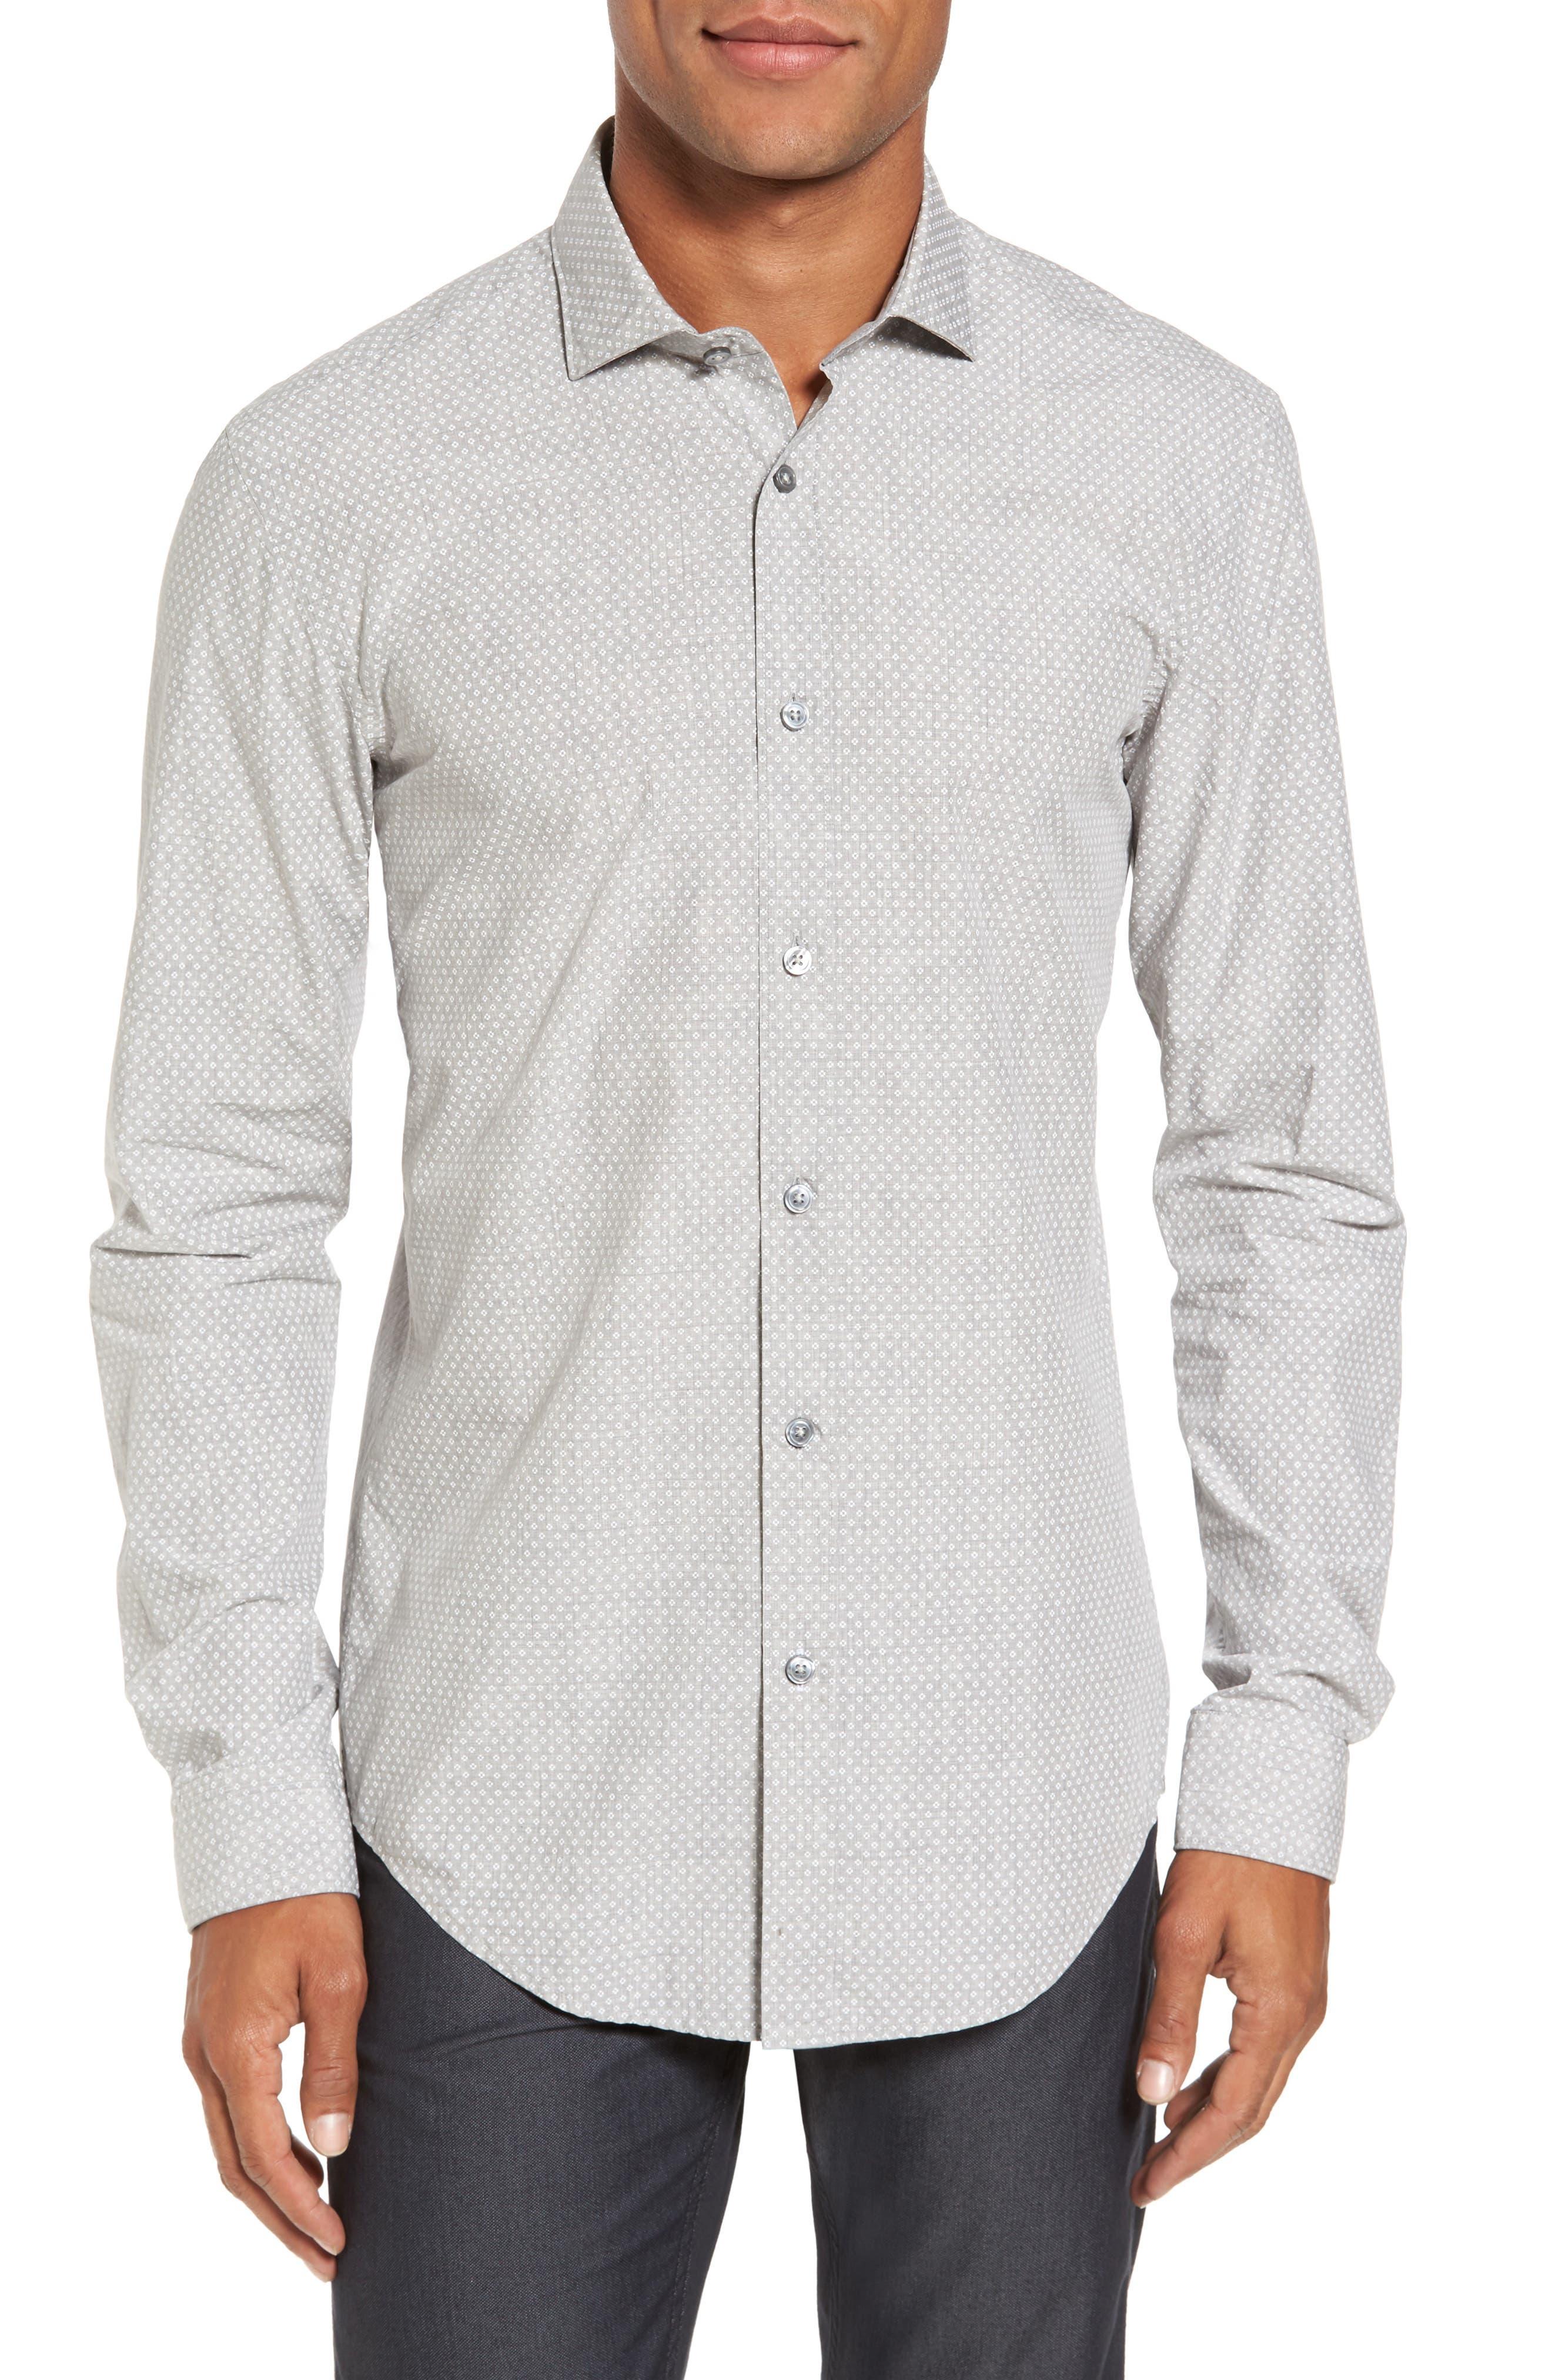 Main Image - BOSS Ridley Slim Fit Micro Diamond Sport Shirt